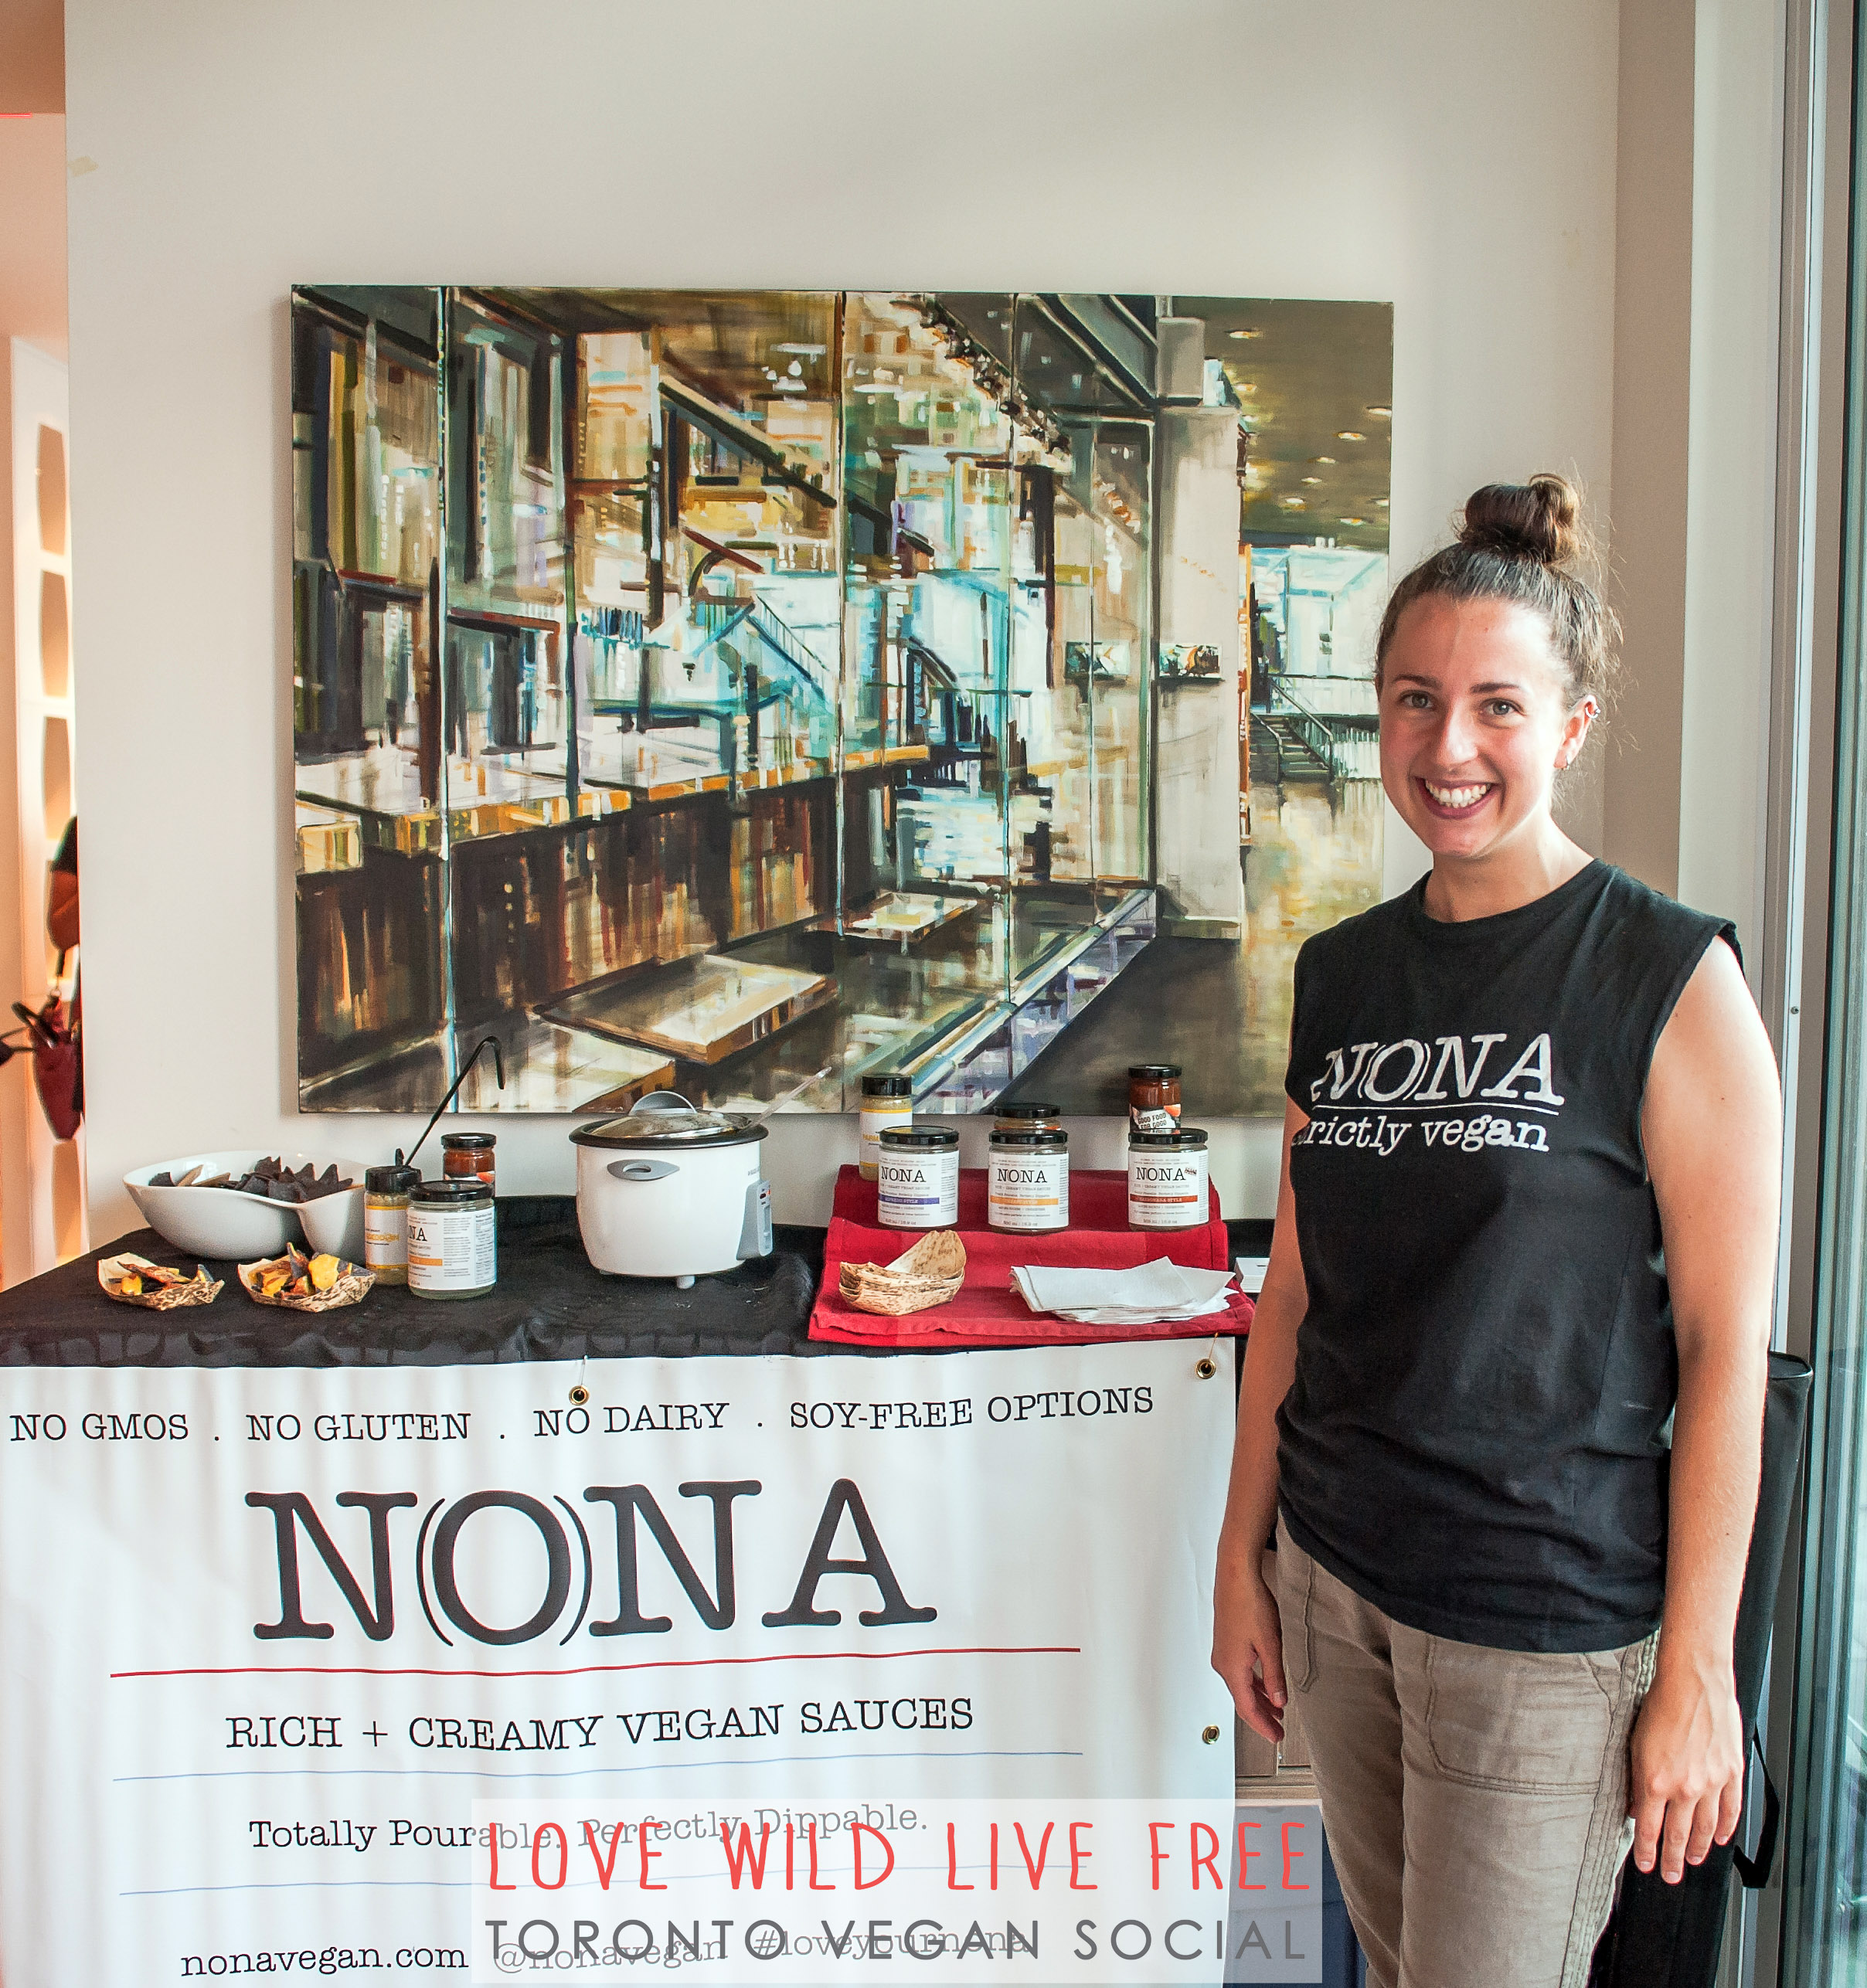 NONA Vegan